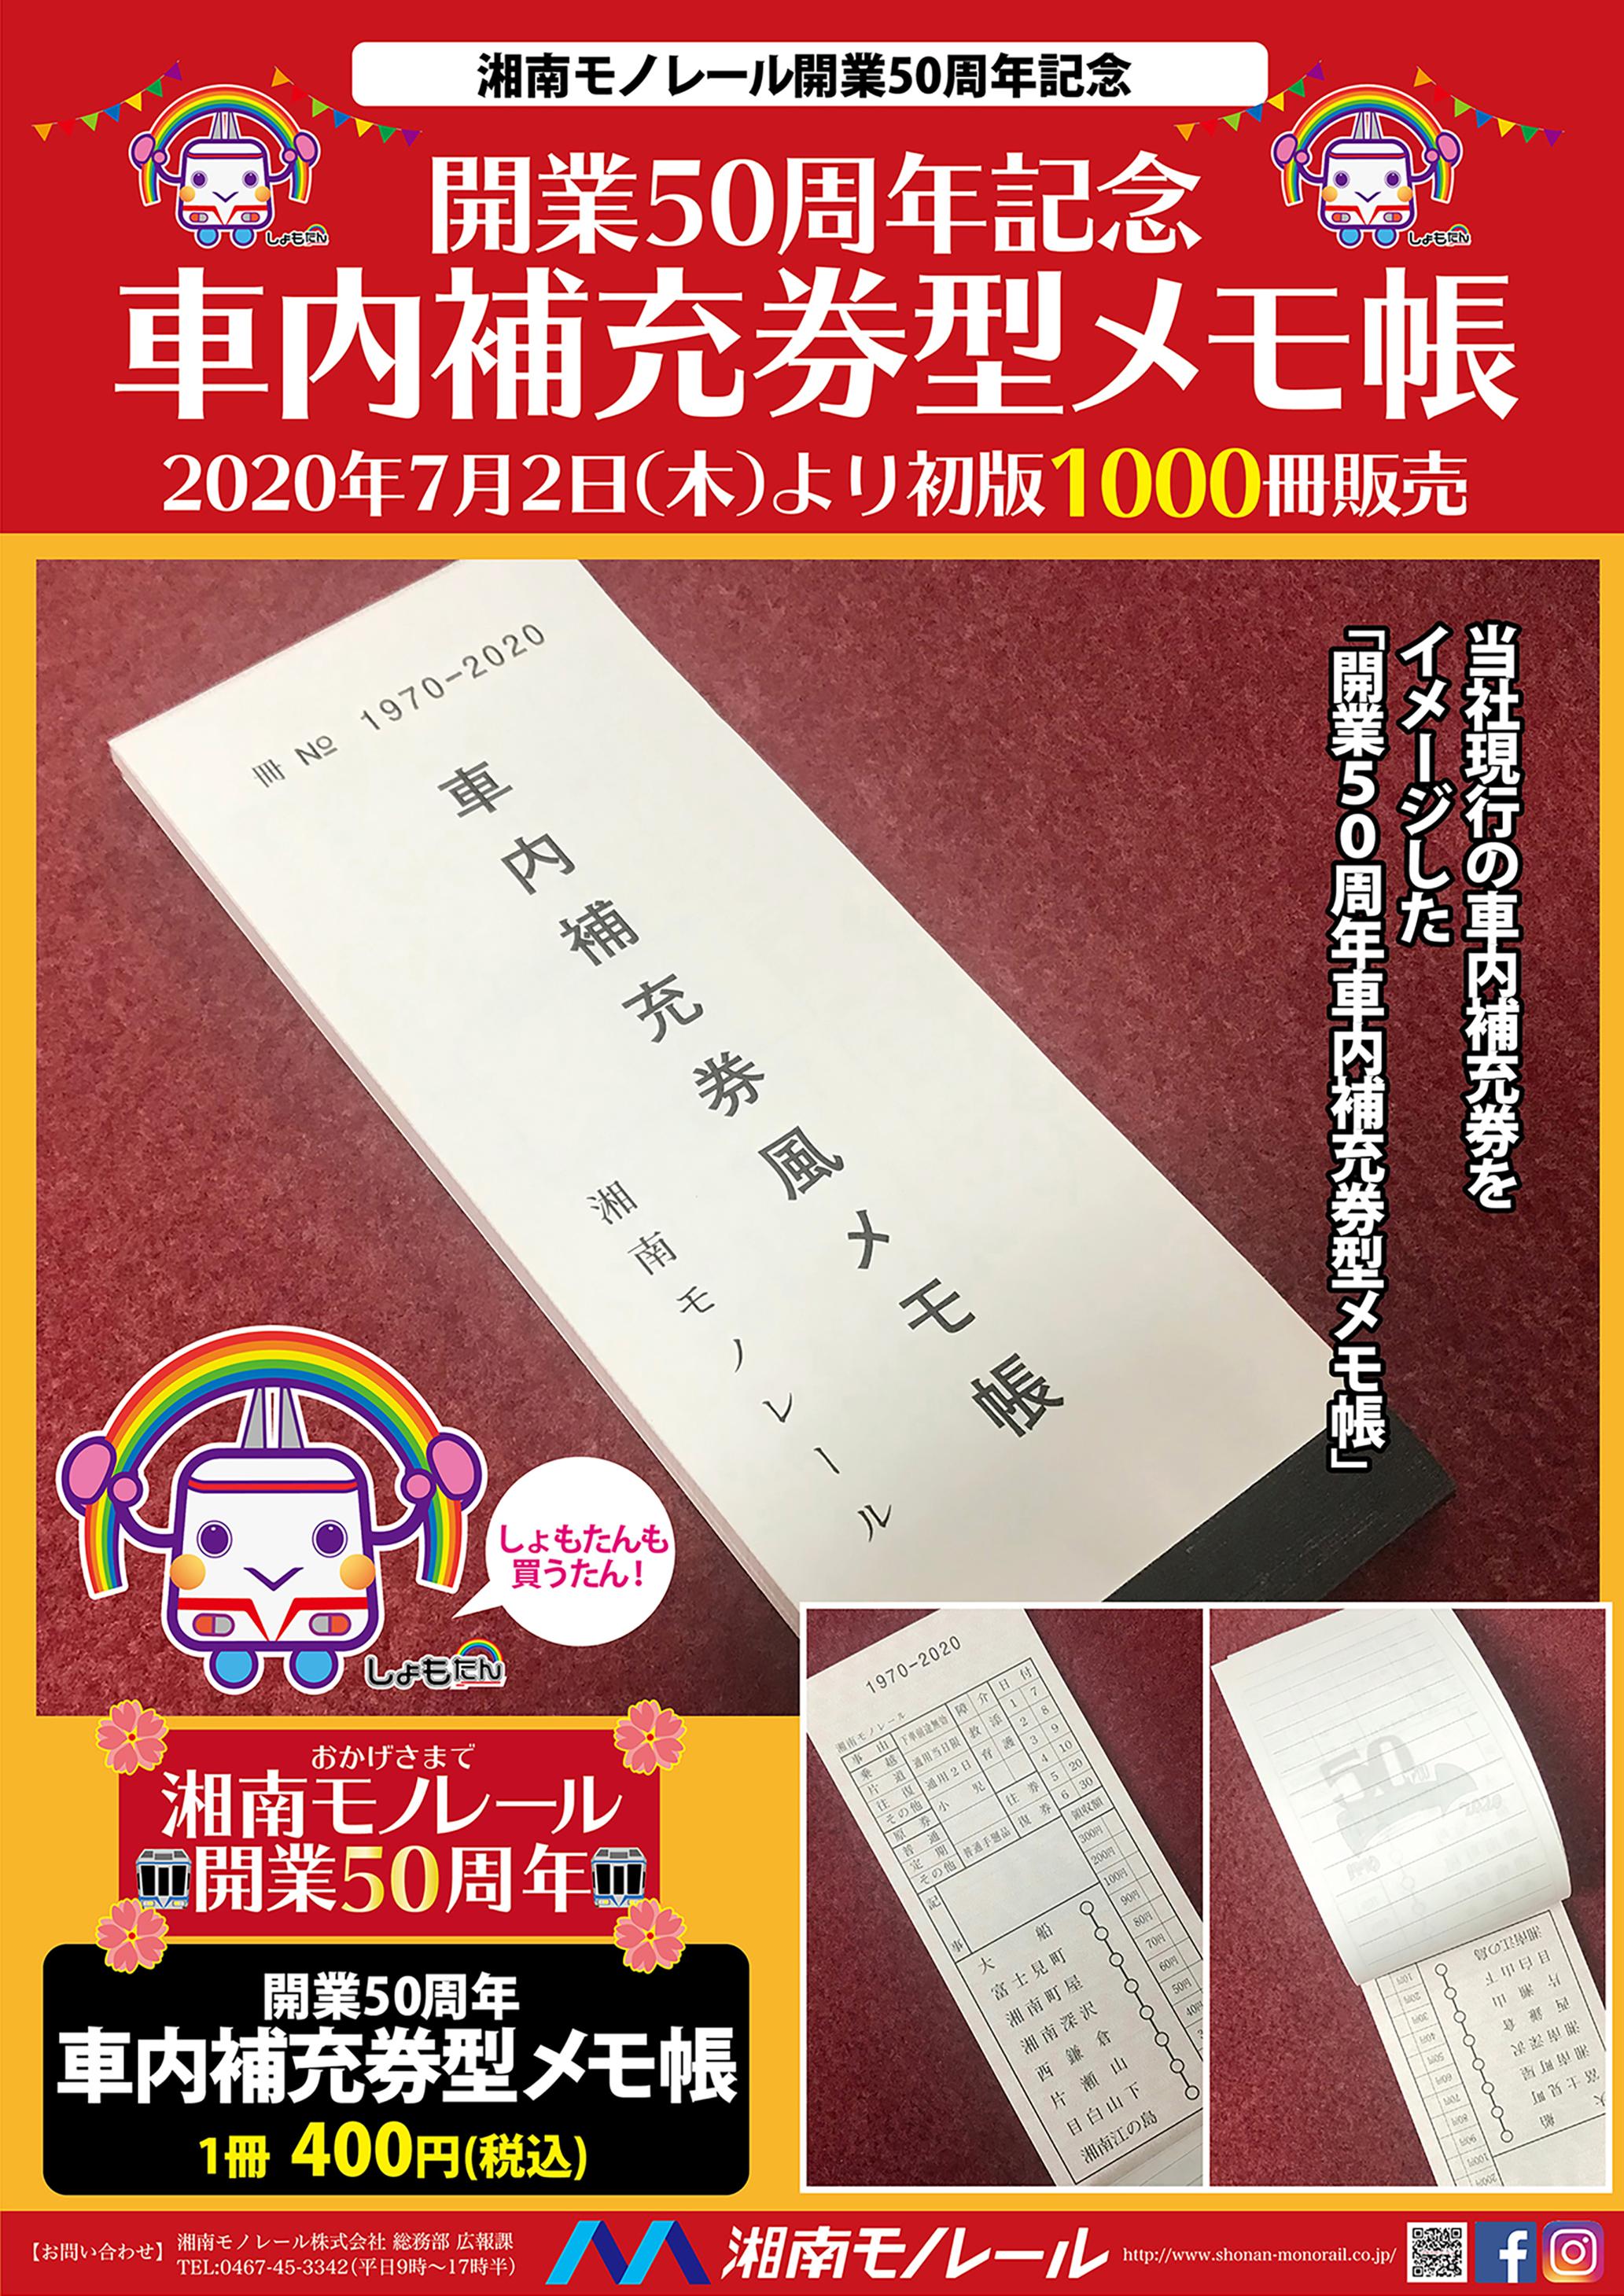 https://www.shonan-monorail.co.jp/news/upload/0a1fd4b6fe355be434945bb8448f0a6bb00f40ce.jpg